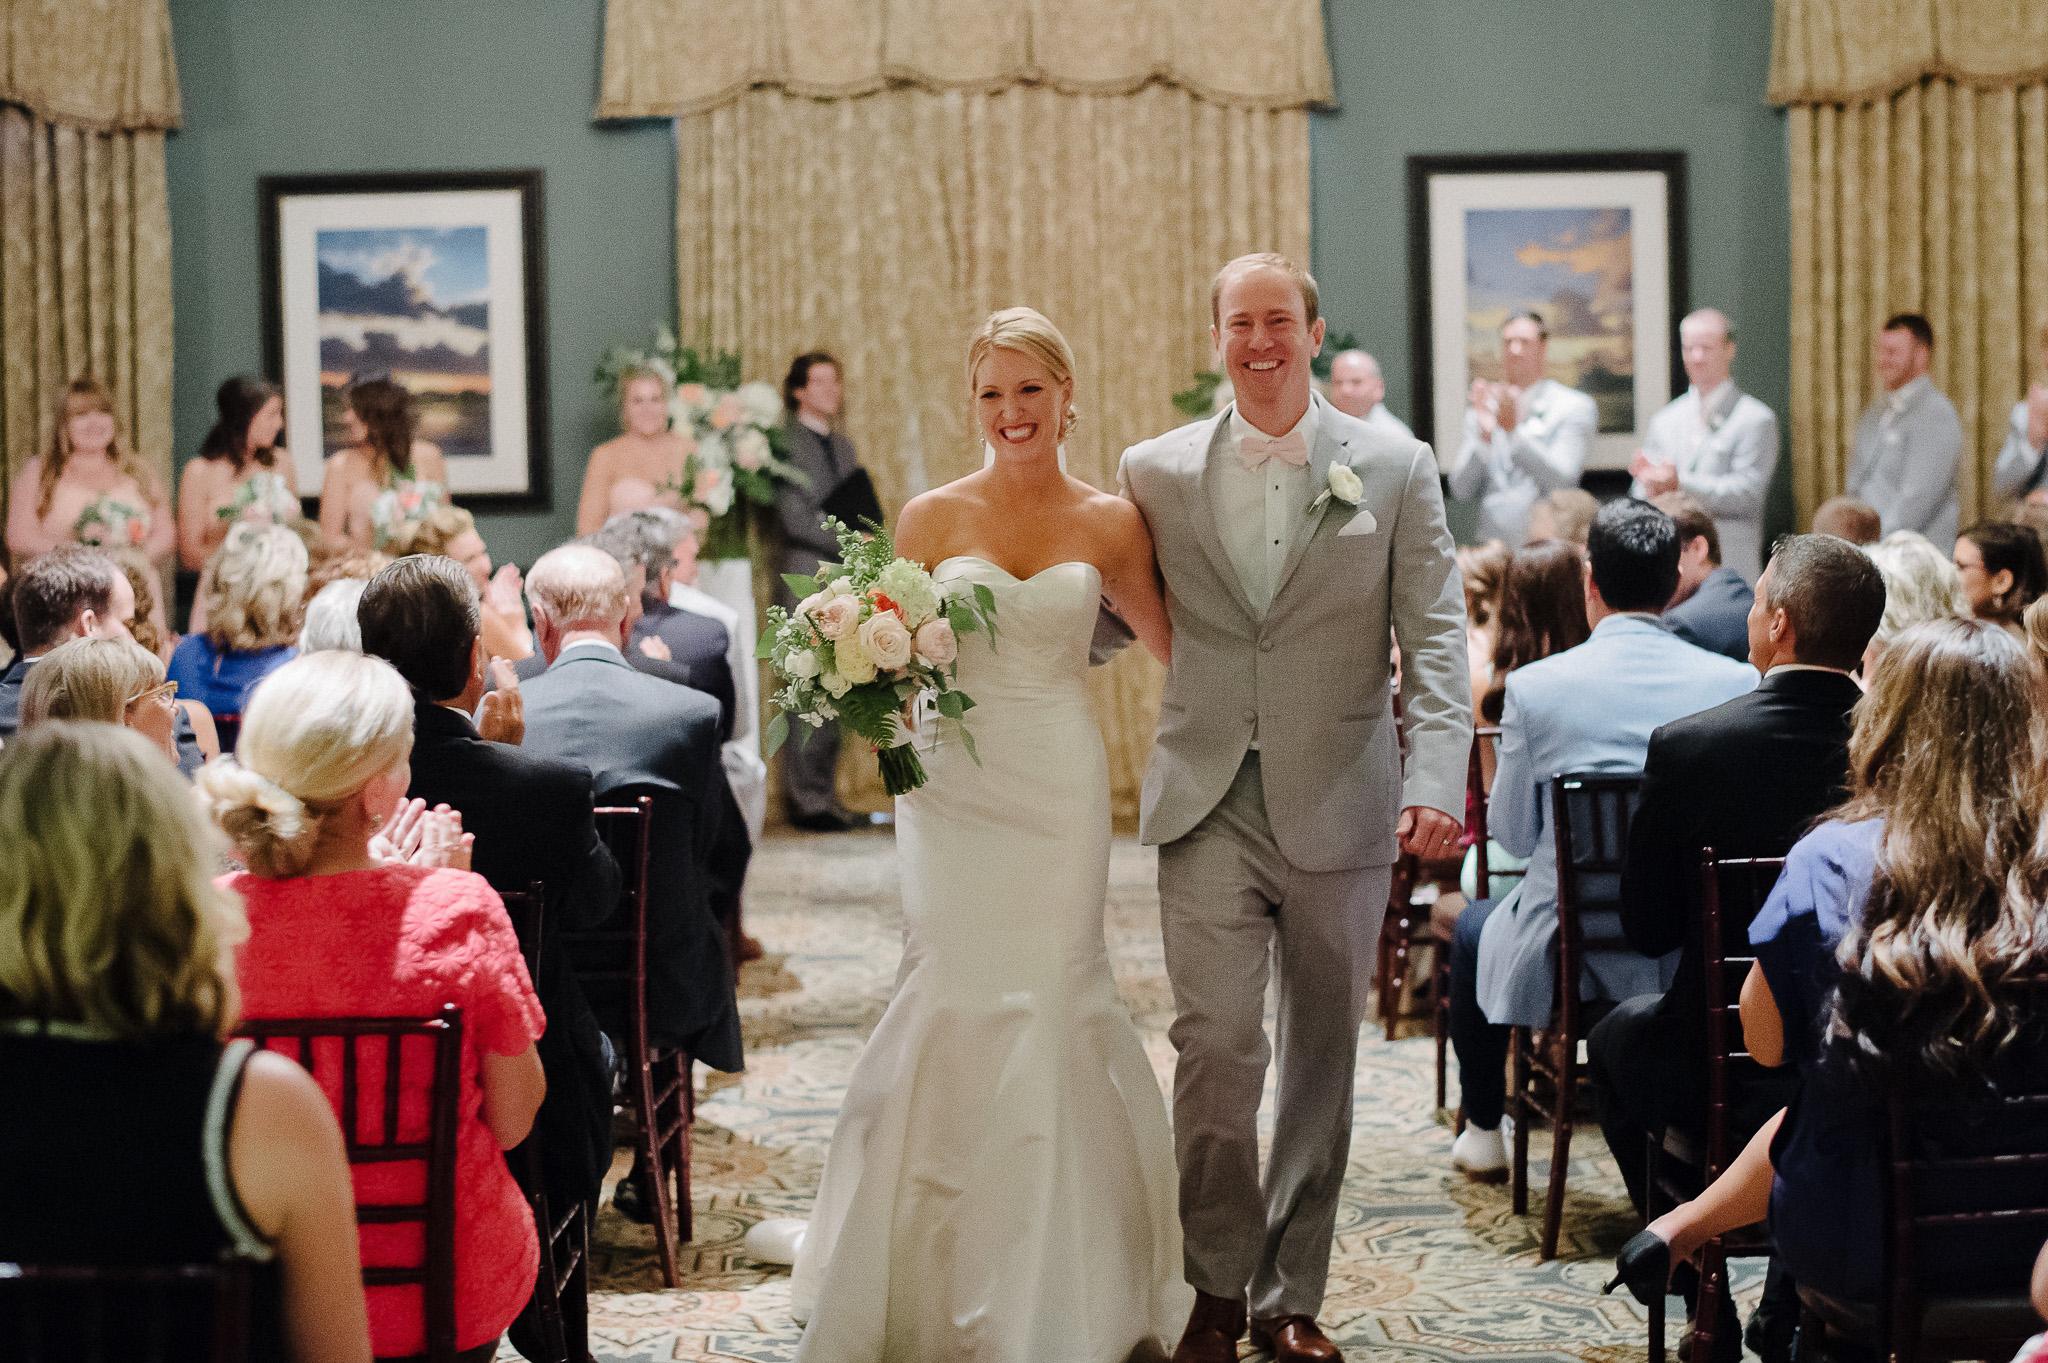 TPC Sawgrass Wedding